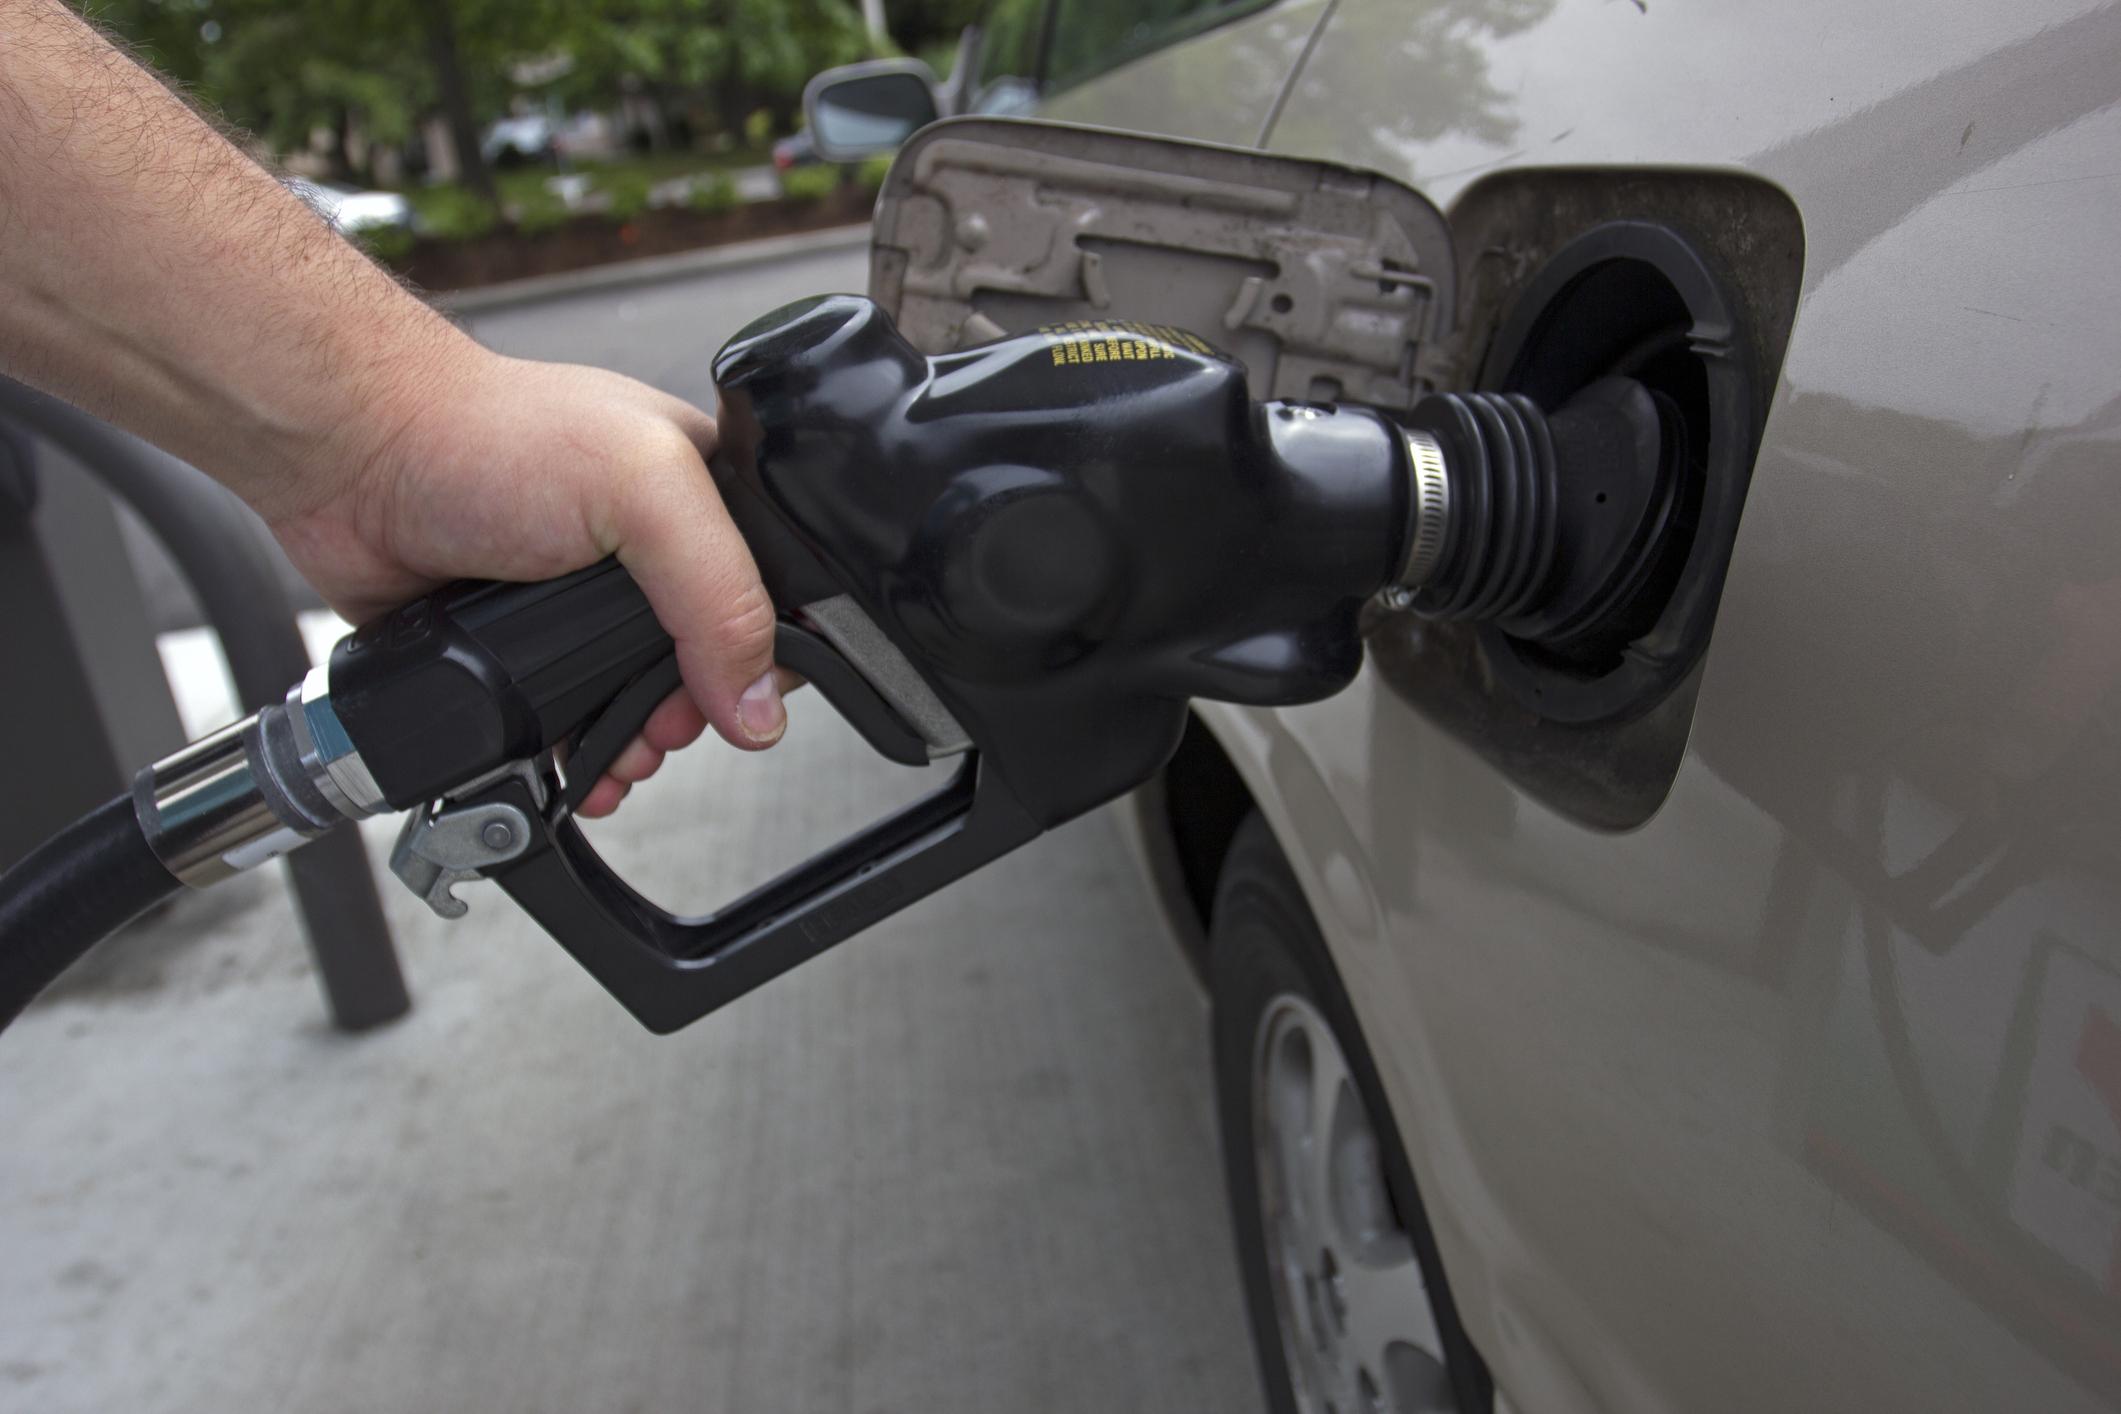 A person pumping gas into their car.